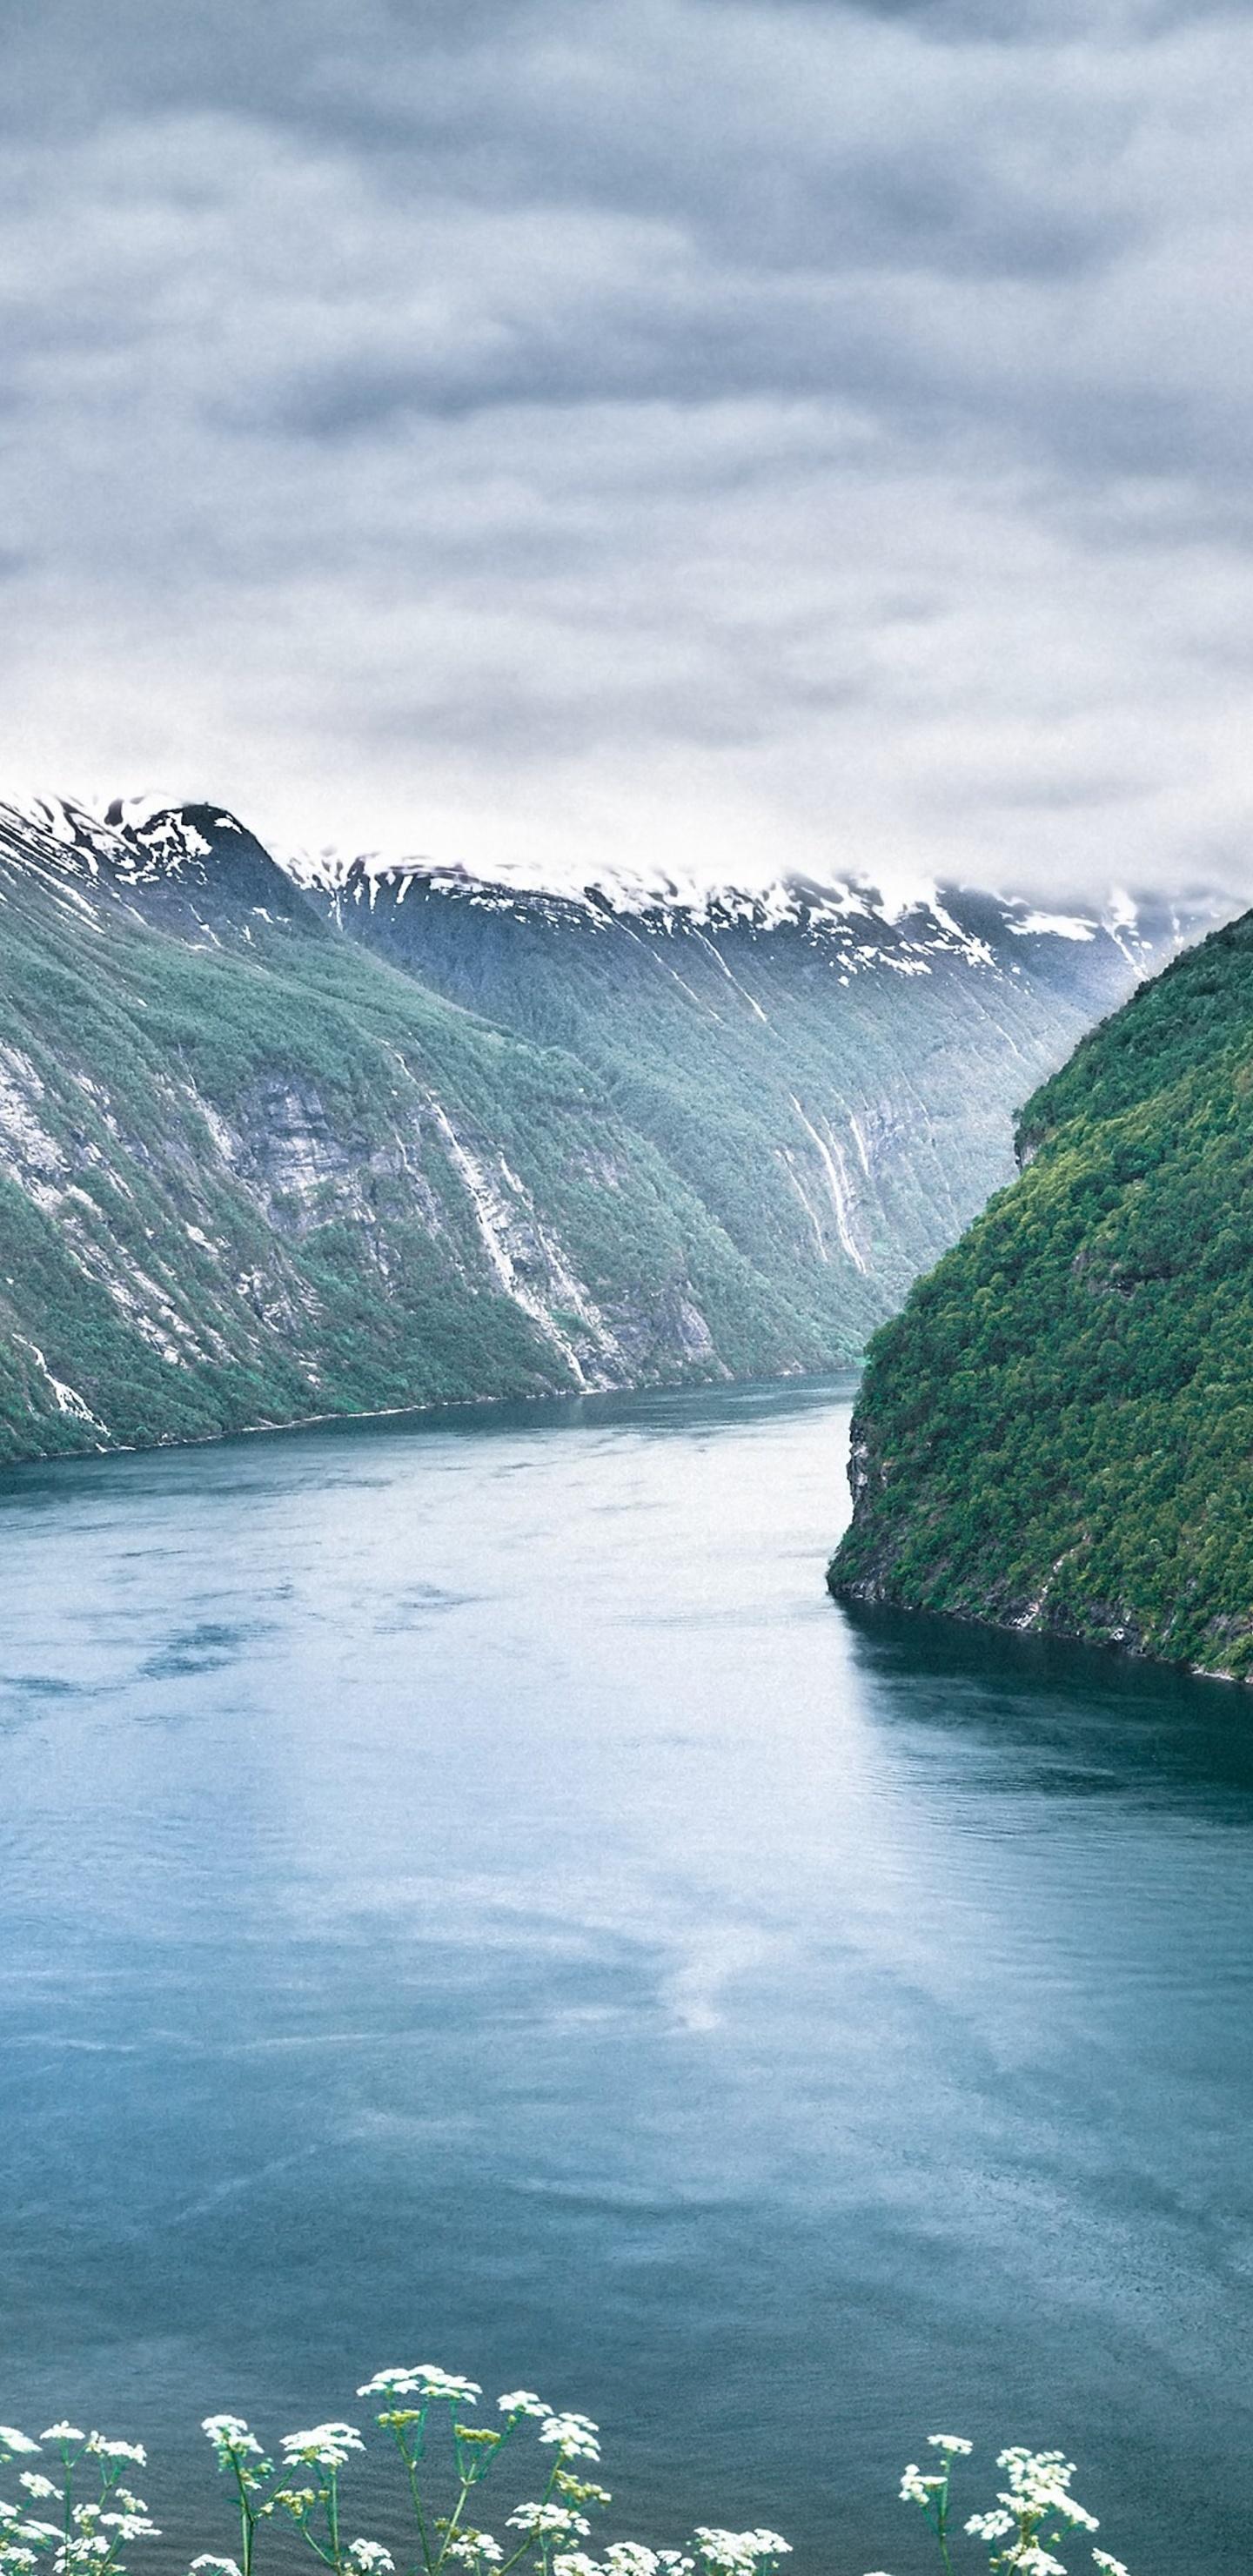 Fjord wallpaper